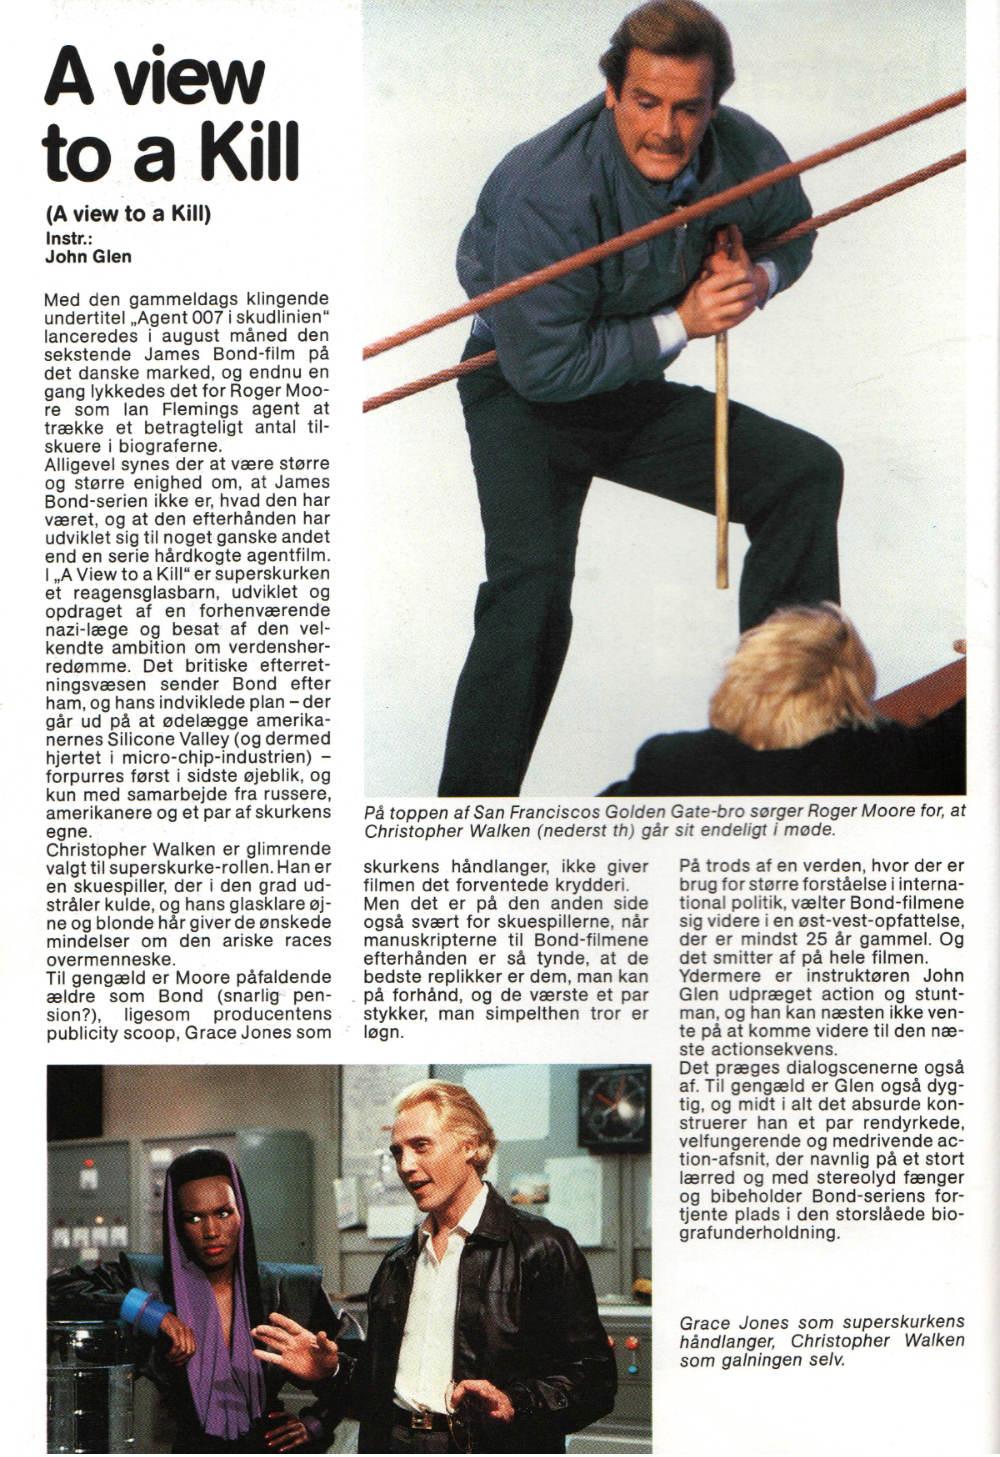 AVTAK Filmårbogen 85 side 16